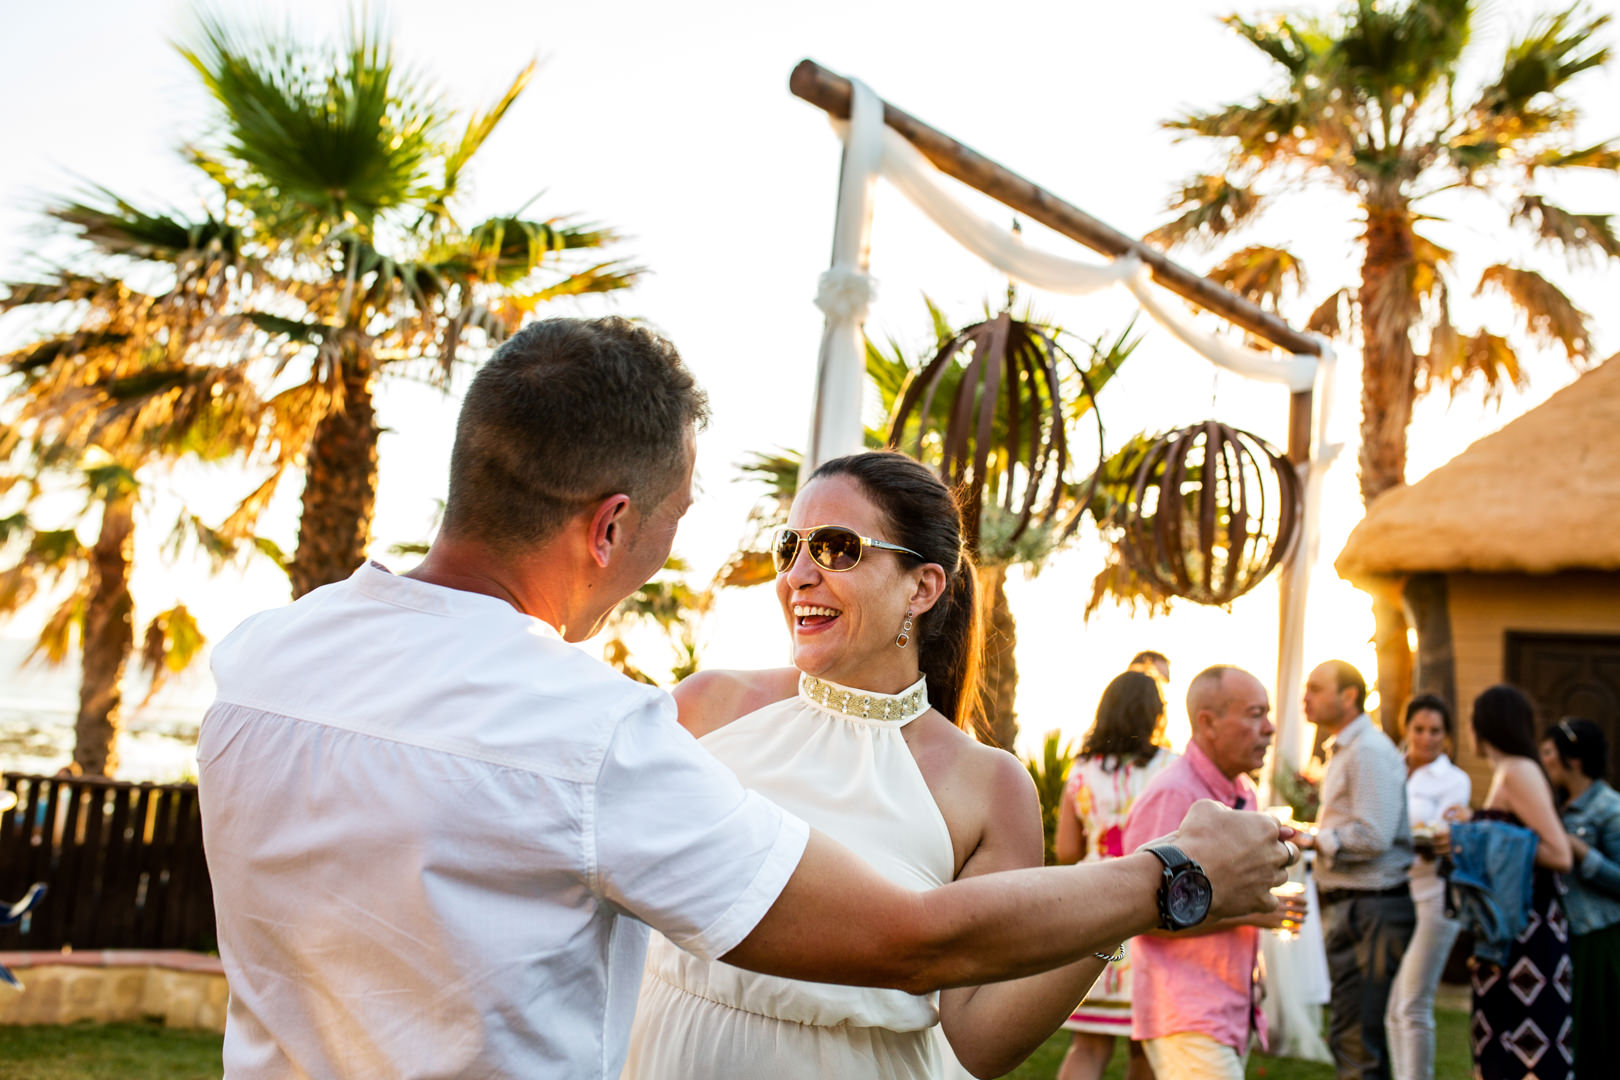 Boda-Sajorami-Beach-Cadiz-Zahora-Pedro-Gema-engagement-Rafael-Torres-fotografo-bodas-sevilla-madrid-barcelona-wedding-photographer--41.jpg